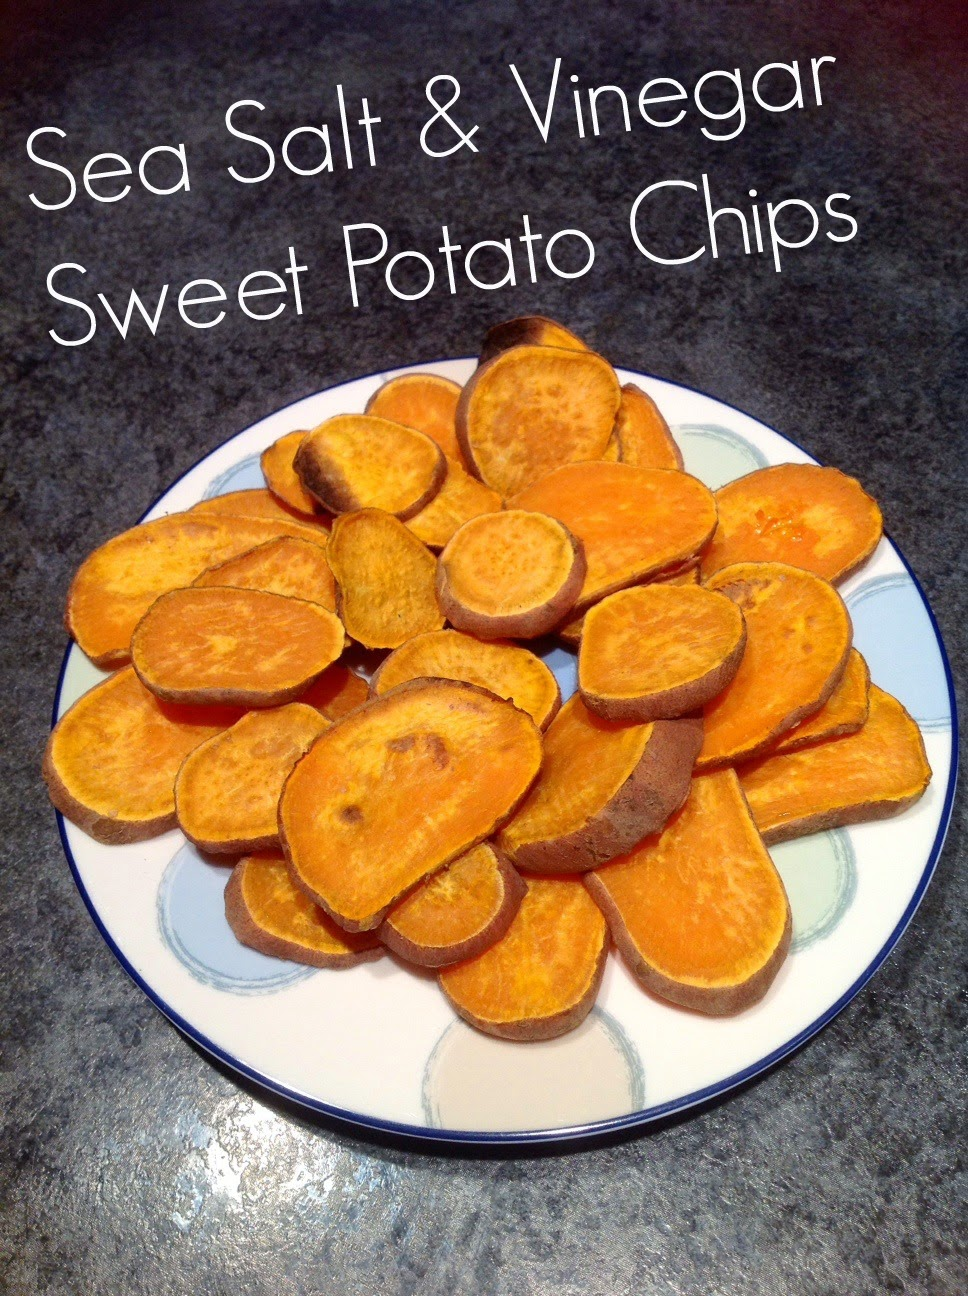 Sea Salt and Vinegar Sweet Potato Chips